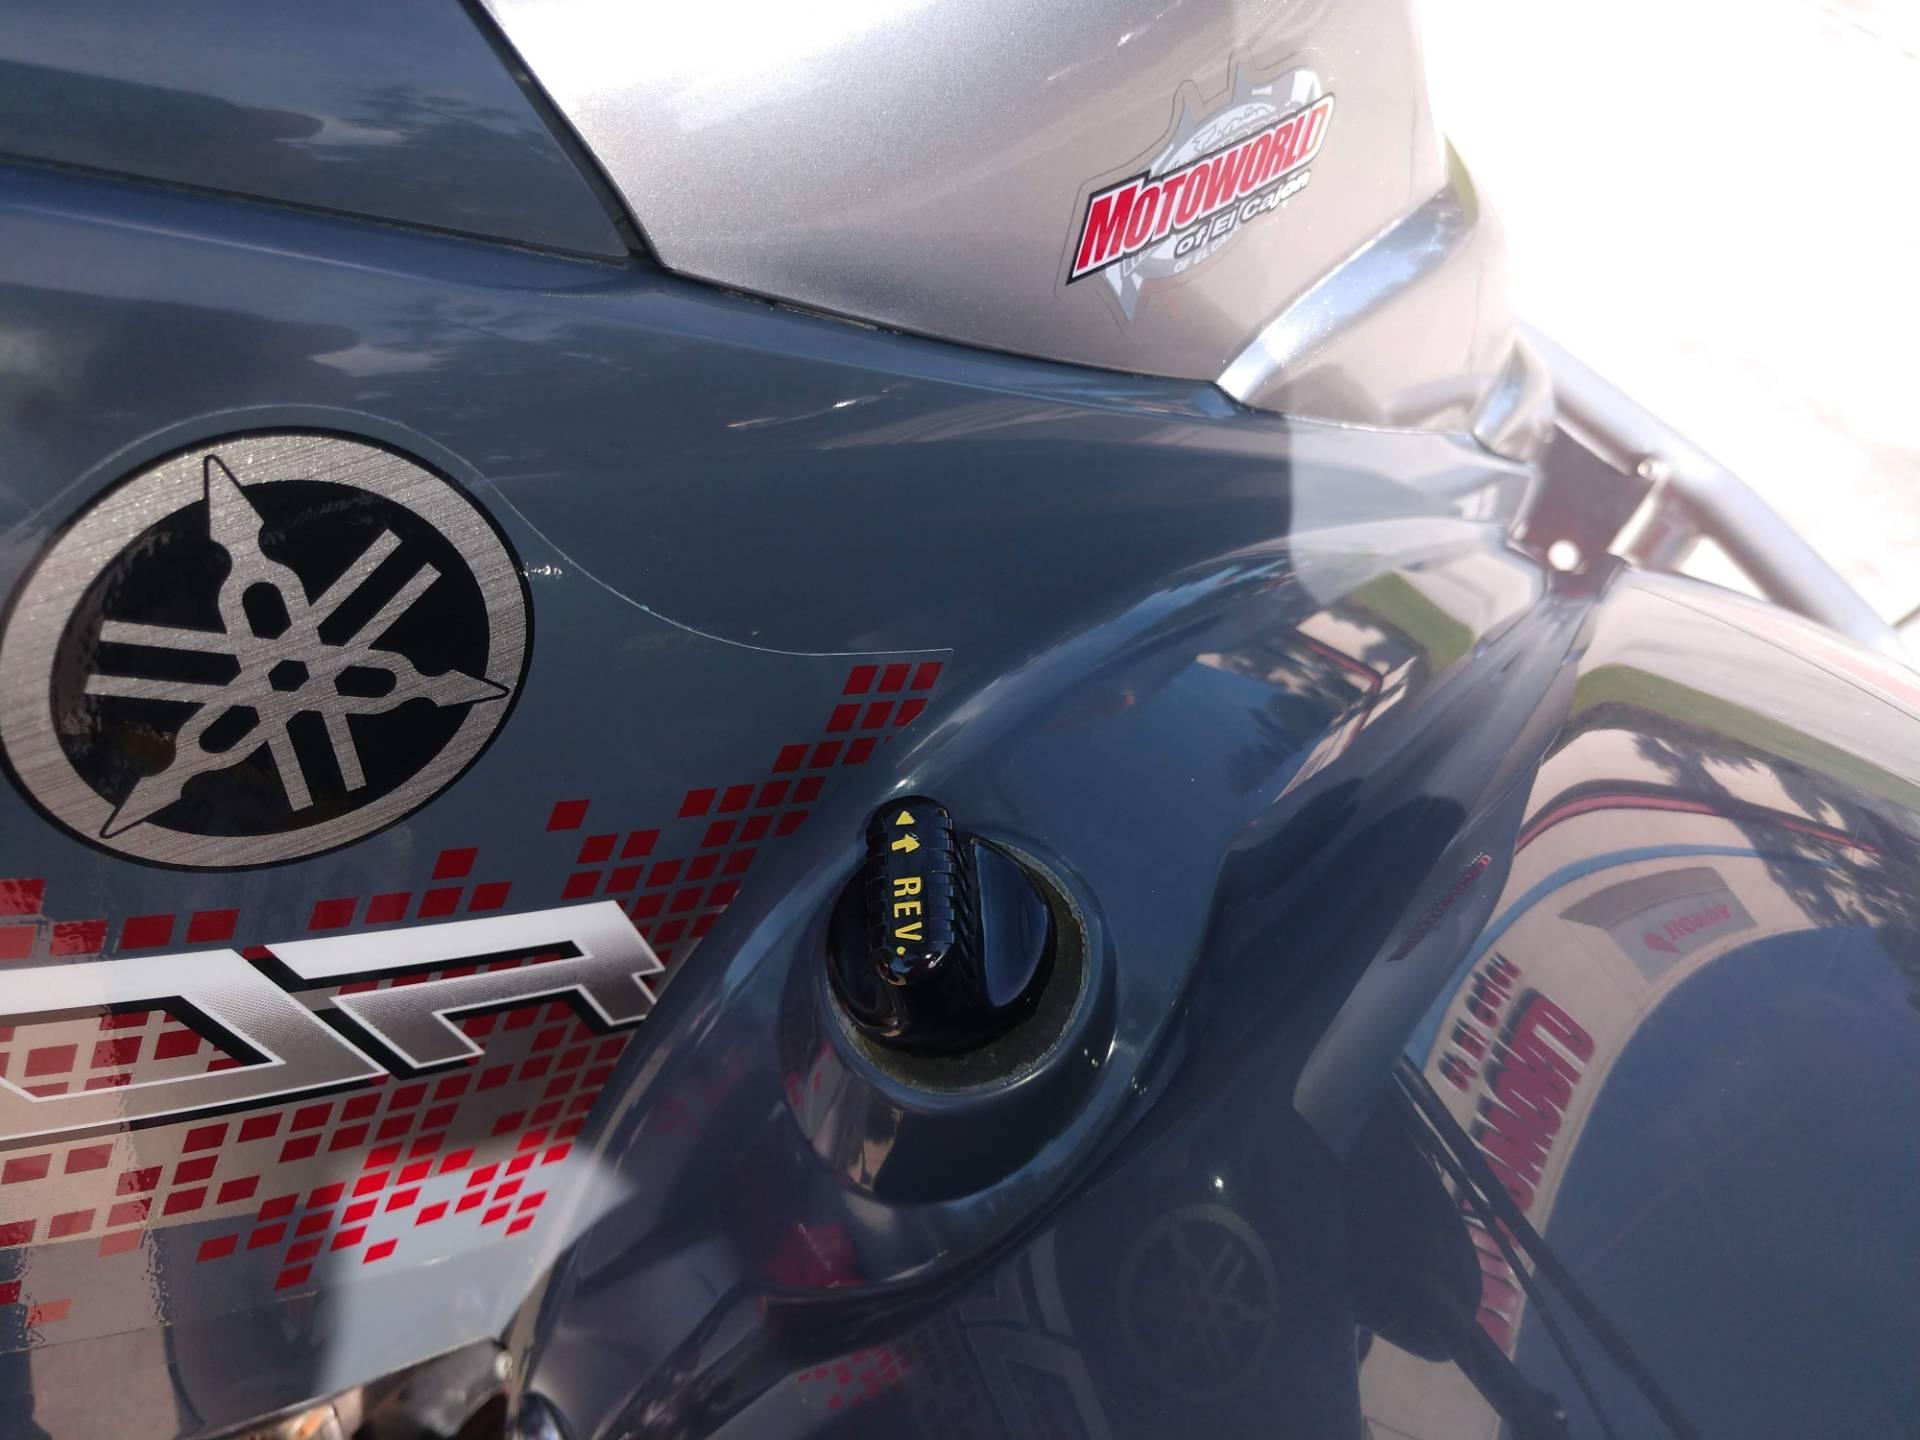 2007 Yamaha Raptor 700R 10